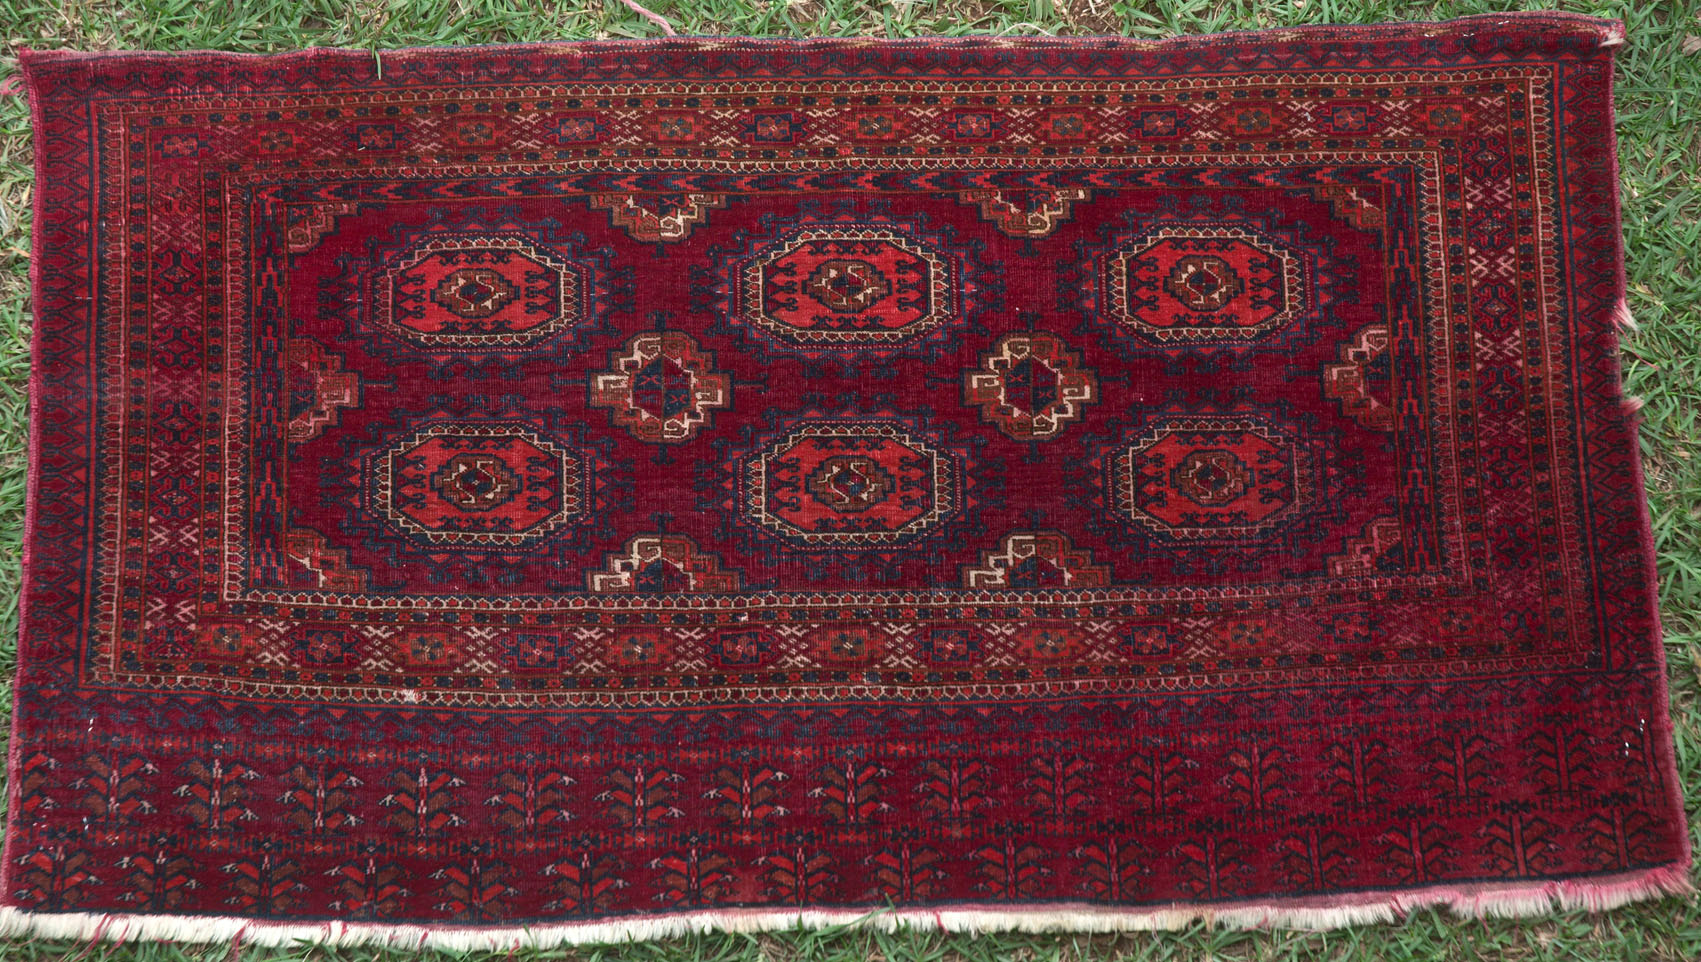 521 A Wonderful Antique Tekke Juval Or Storage Bag